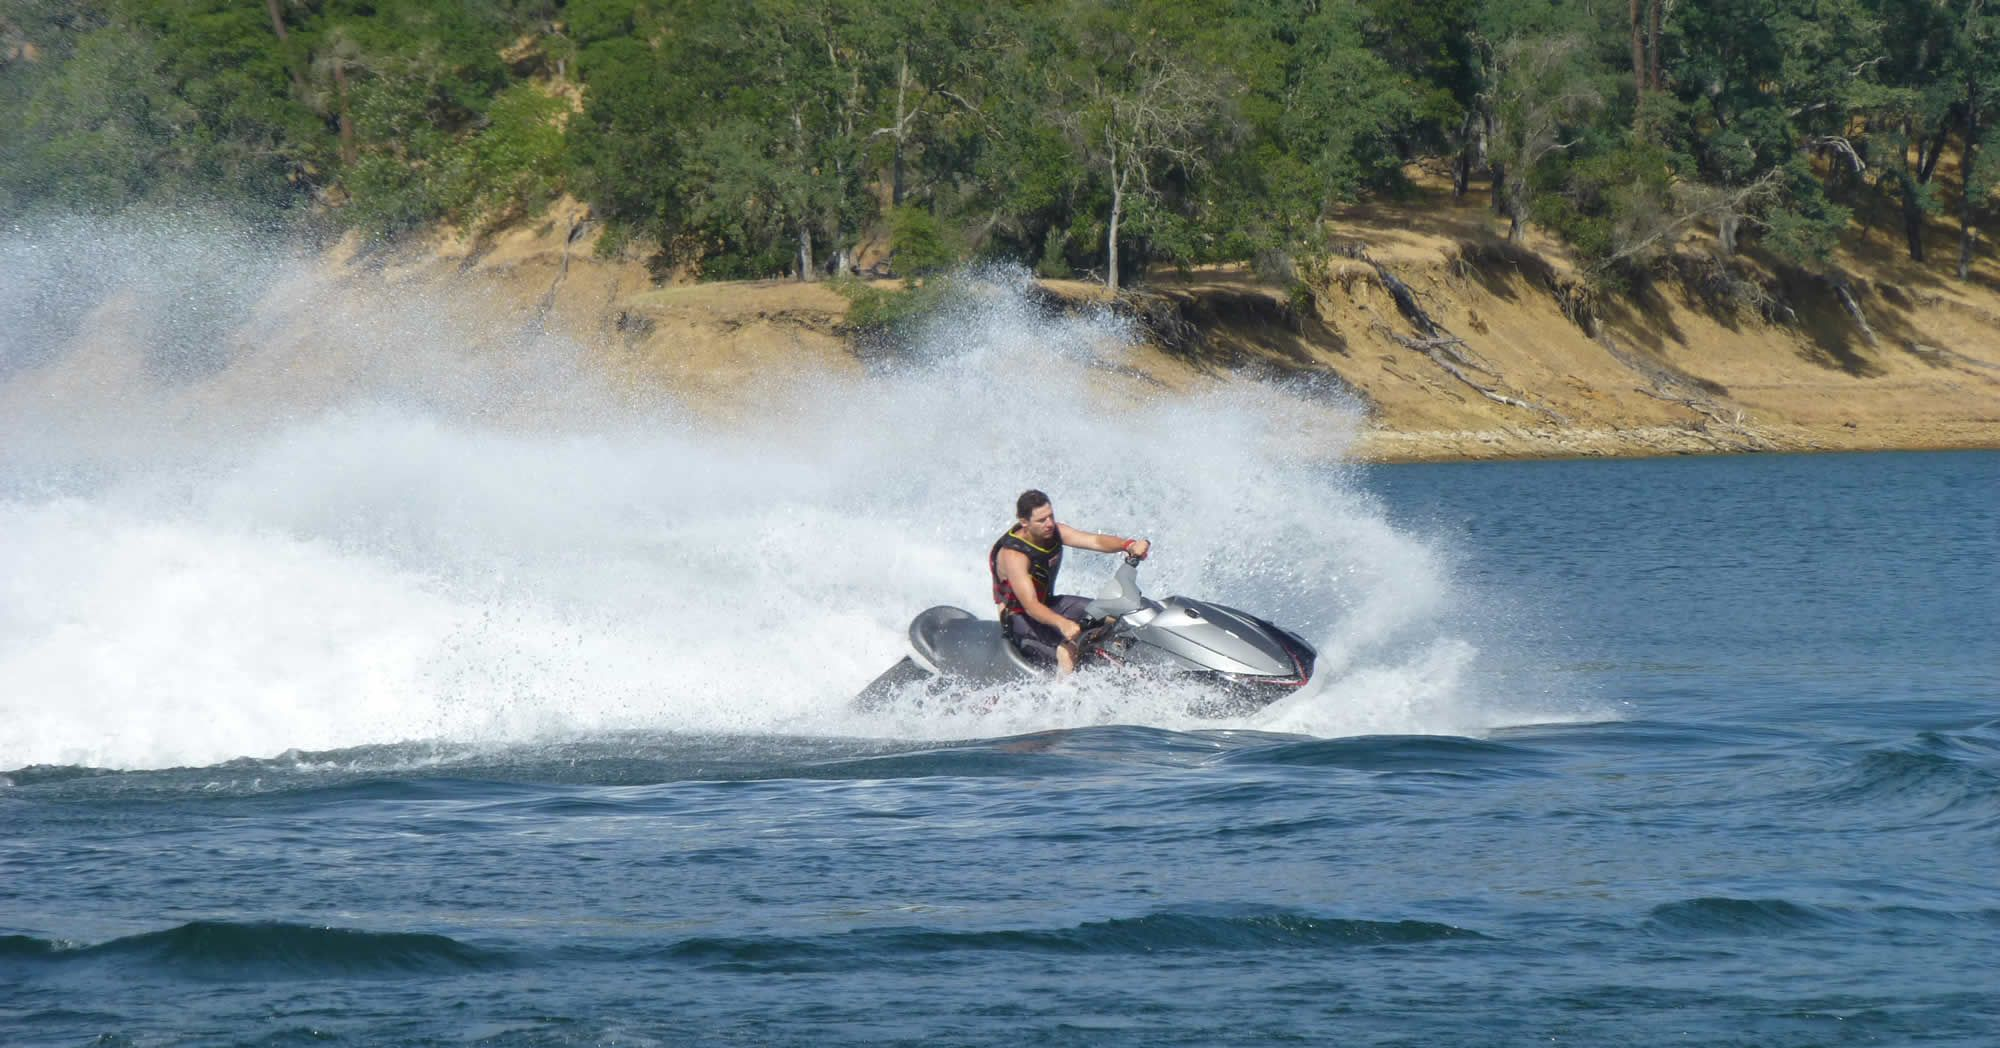 Lake Berryessa Boat And Jet Ski Rentals Boating Fun At Lake Berryessa Jet Ski Rentals Jet Ski Wakeboard Boats